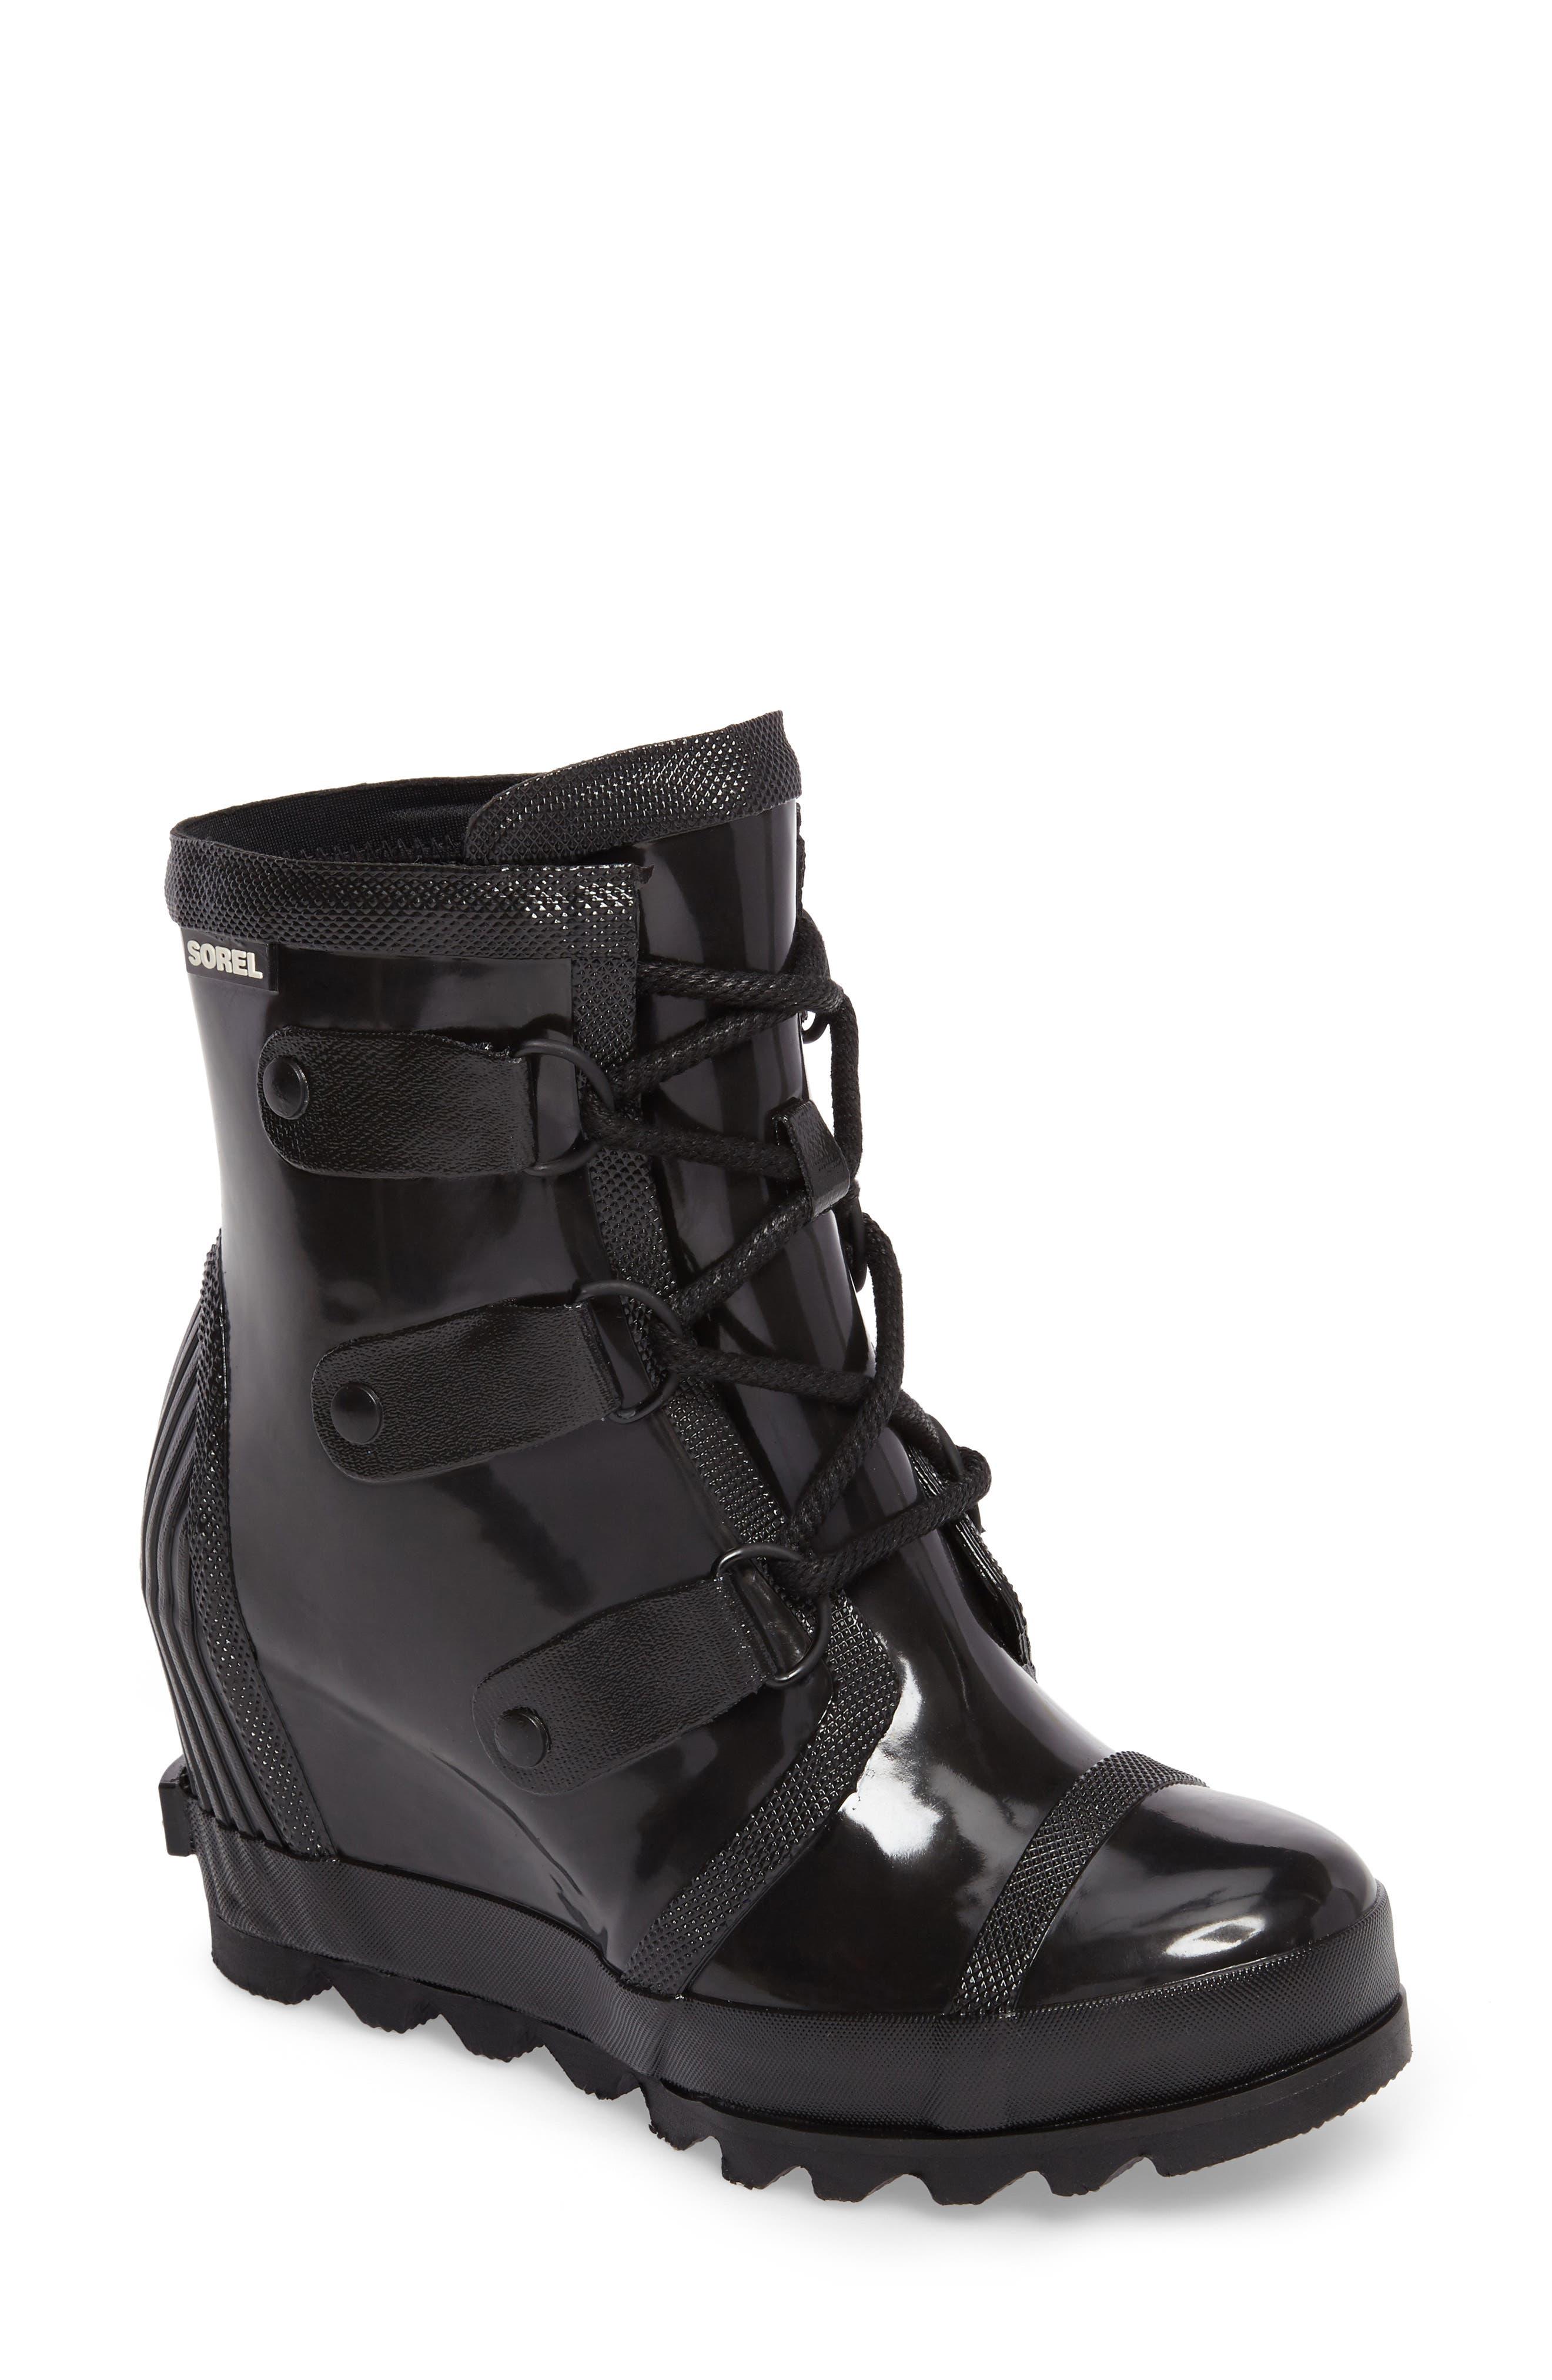 Women's High Rain Snow Boots (Adults)